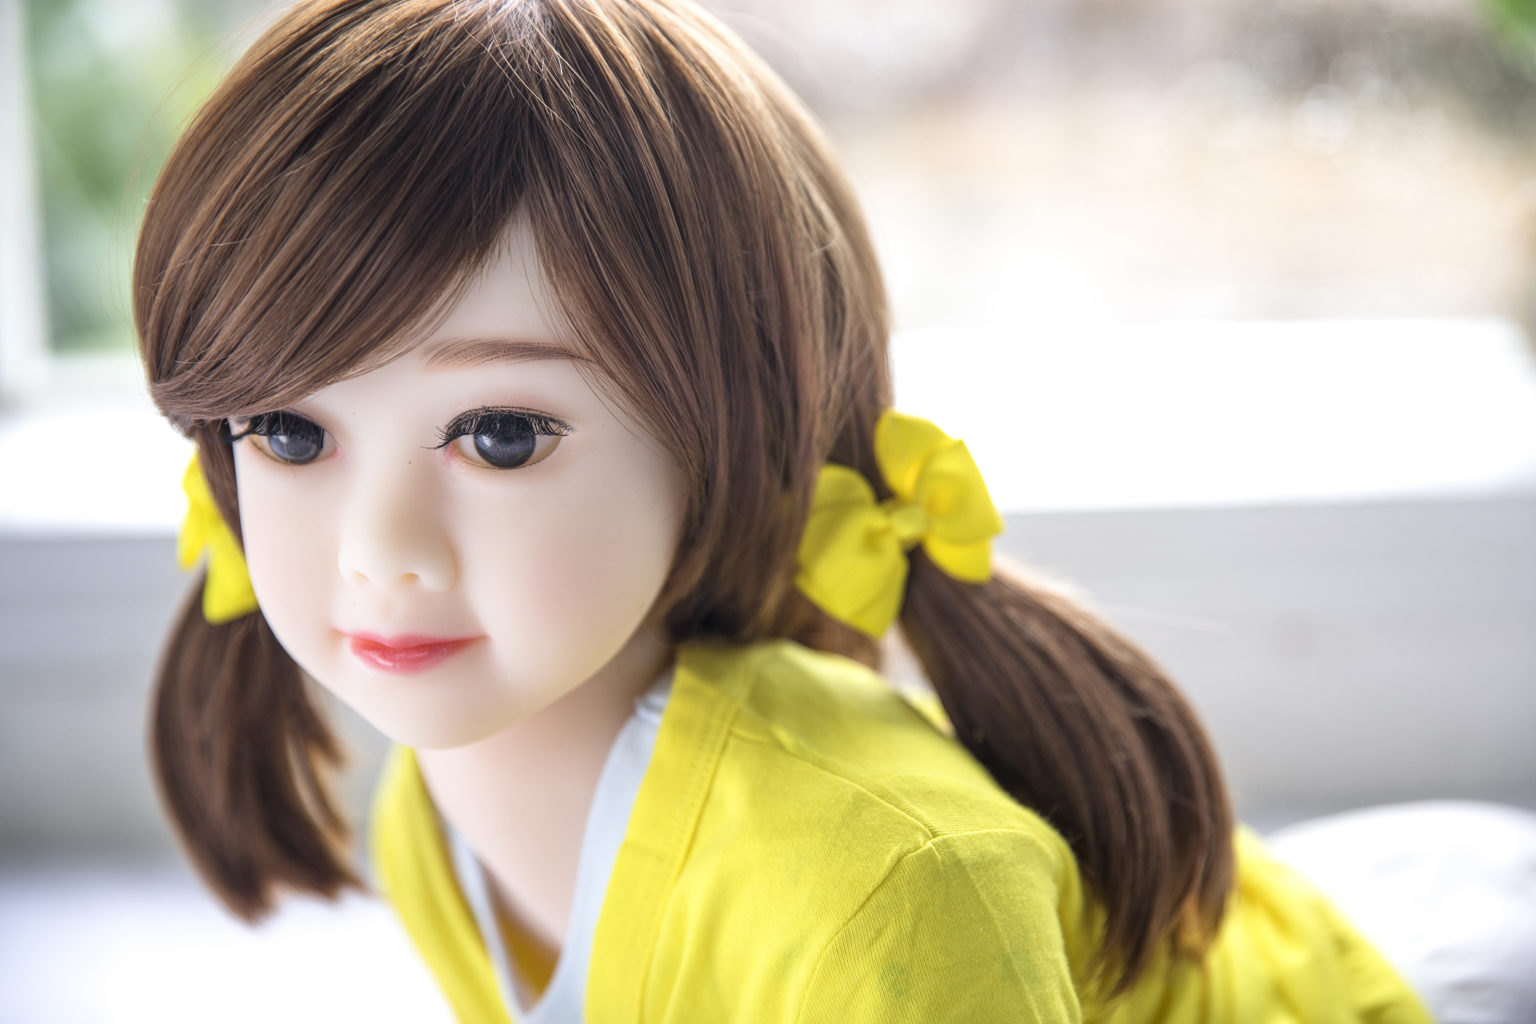 Kayla - Cutie Doll 3′ 3 (100cm) Cup A - AINIDOLL- A